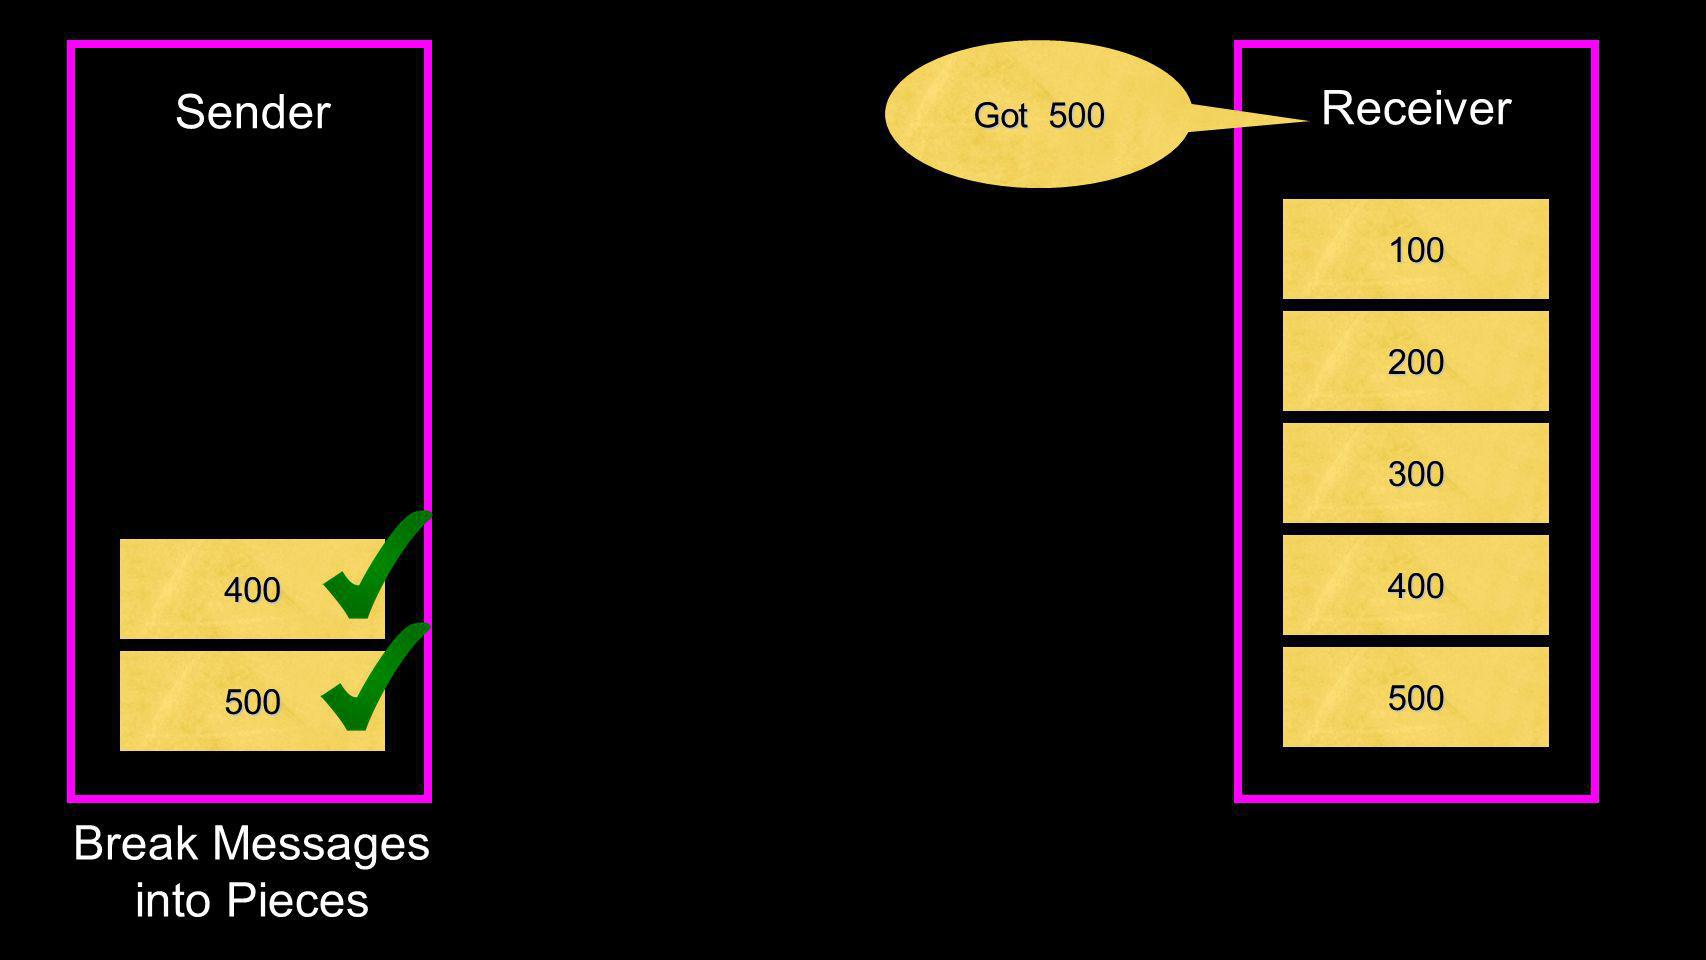 400 500 Break Messages into Pieces Sender 100 200 300 400 Receiver Got 500 500